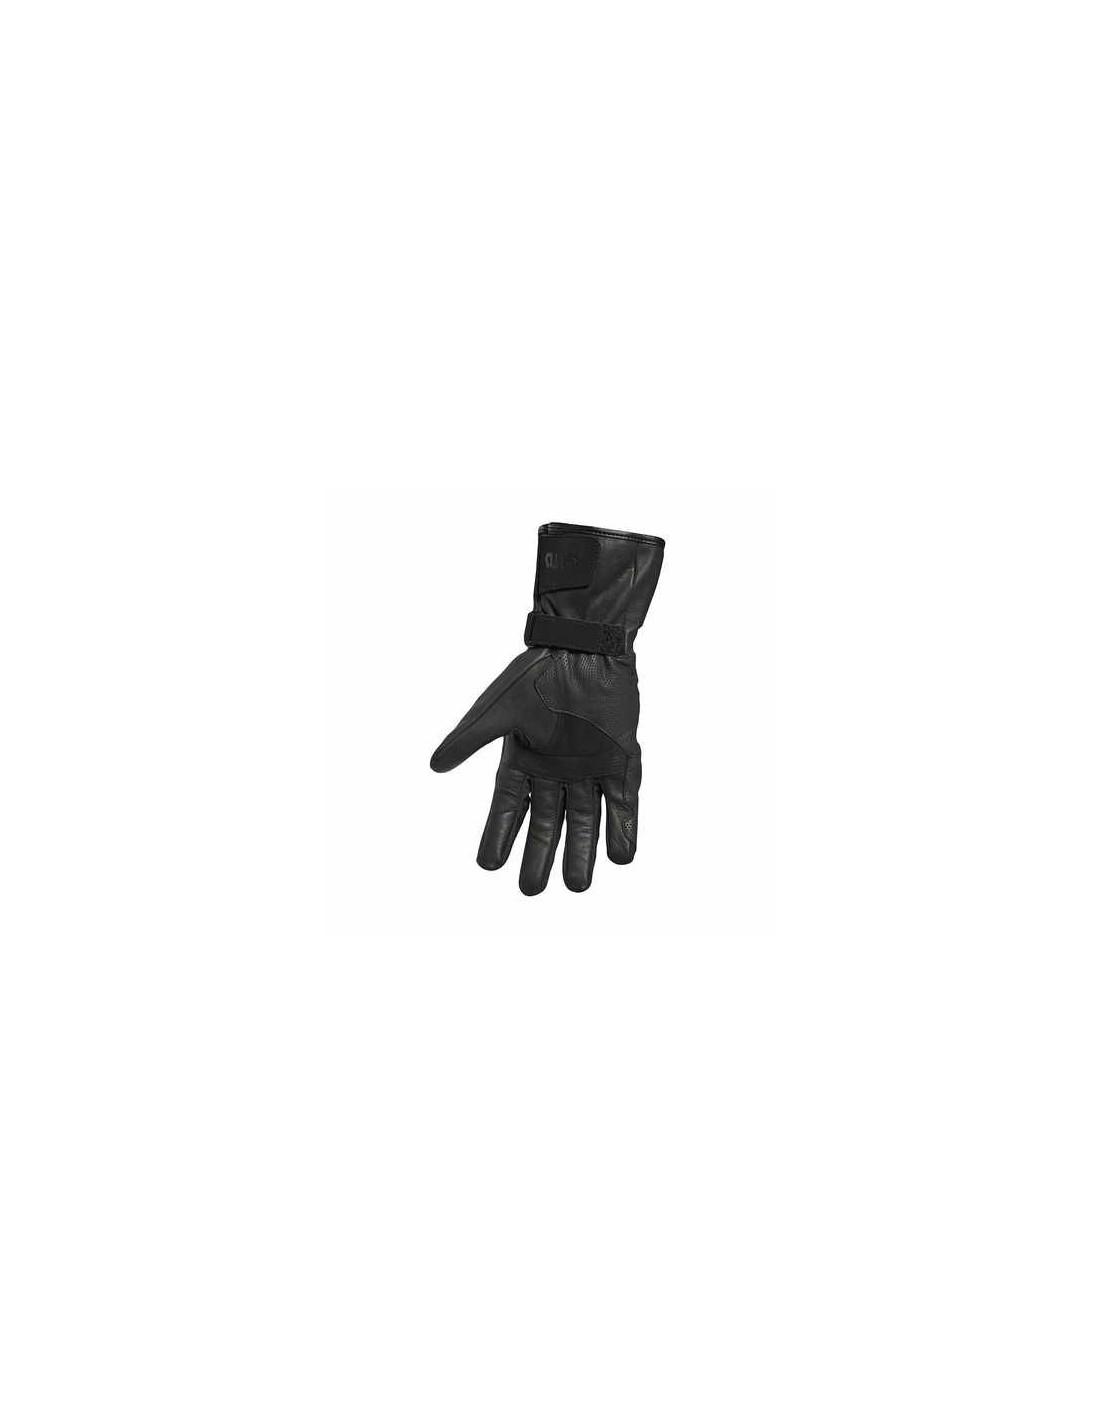 casque moto jet guns elite noir mat gunswear. Black Bedroom Furniture Sets. Home Design Ideas